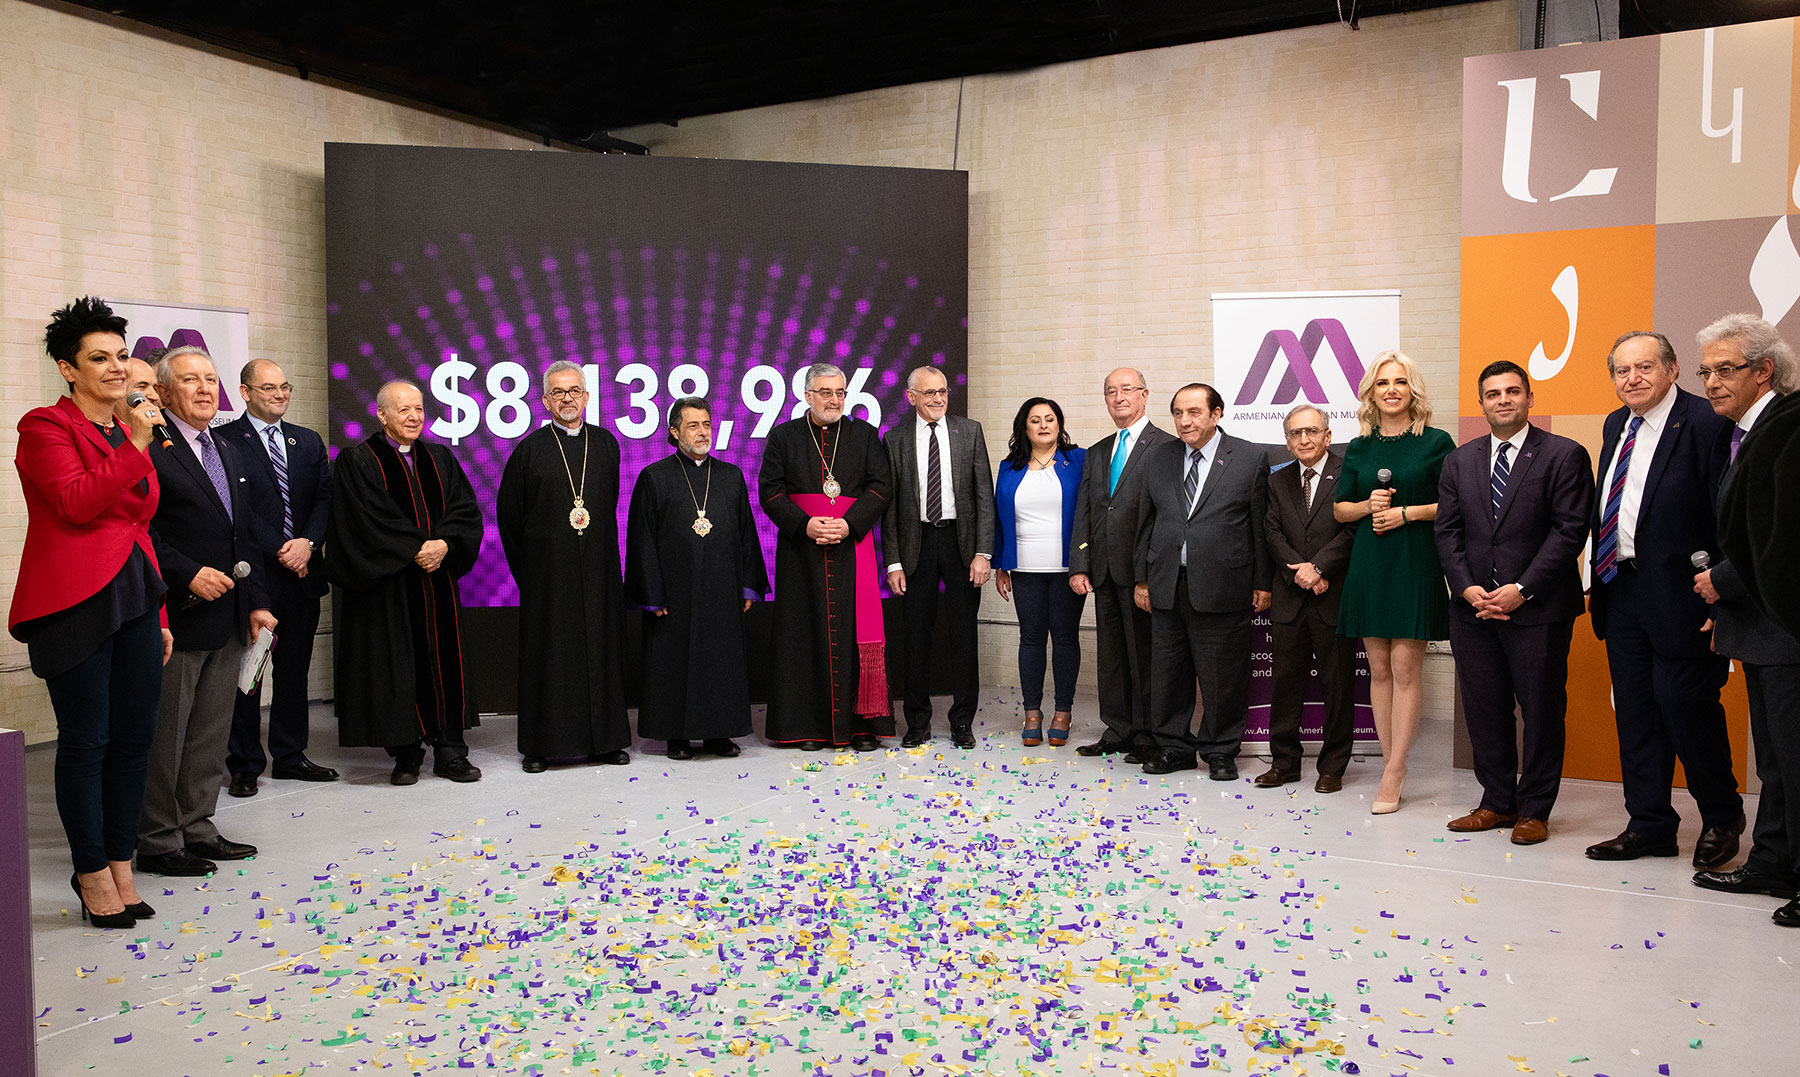 Armenian American Museum Announces $8.1 Million at Inaugural Telethon